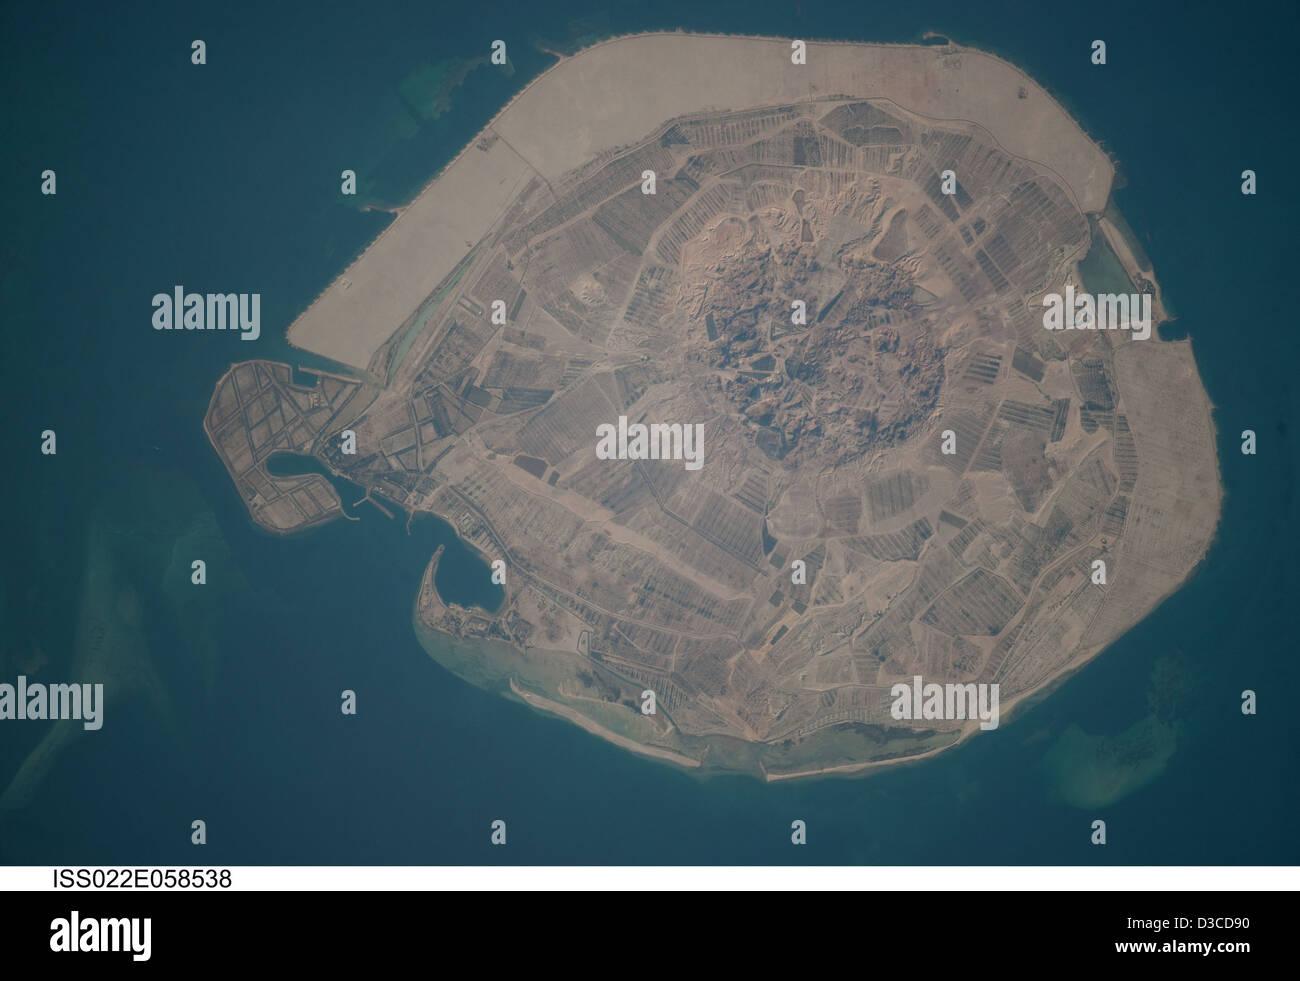 Sir Bani Yas Island (NASA, International Space Station Science, 01/31/10) - Stock Image